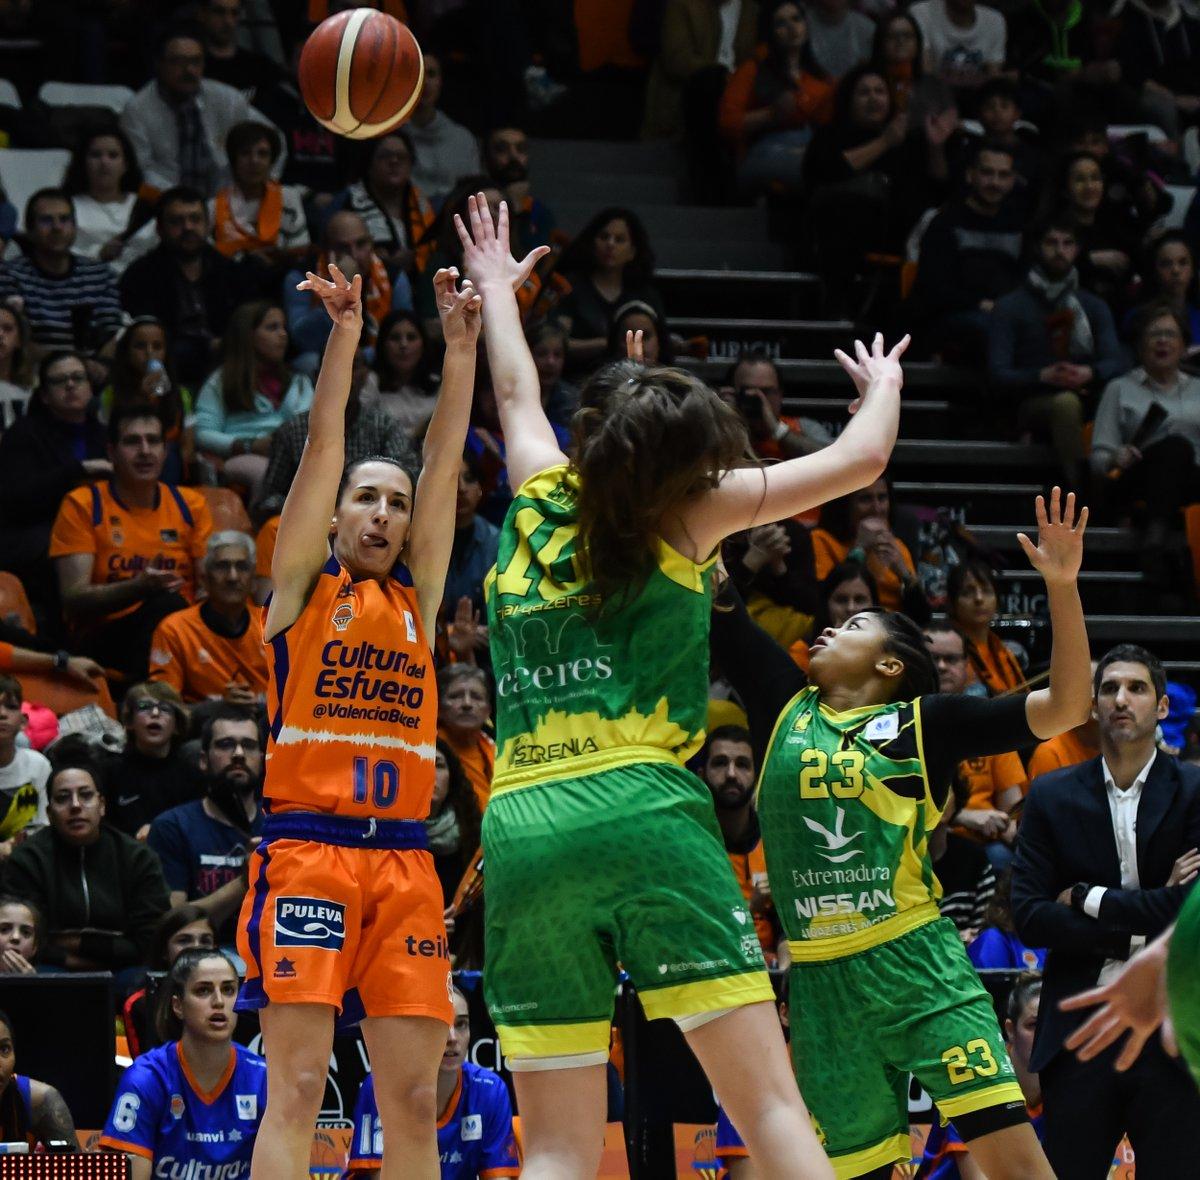 📝 La crónica de la gran victoria de hoy en la Fonteta  @valenciabasket 66 🆚 @CBALQAZERES 48 🏆 J20 #LFEndesa  Castellano http://bit.ly/2OVE0Xu  Valencià http://bit.ly/2HtArUk  English http://bit.ly/37zuorD  📸 Isaac Ferrera